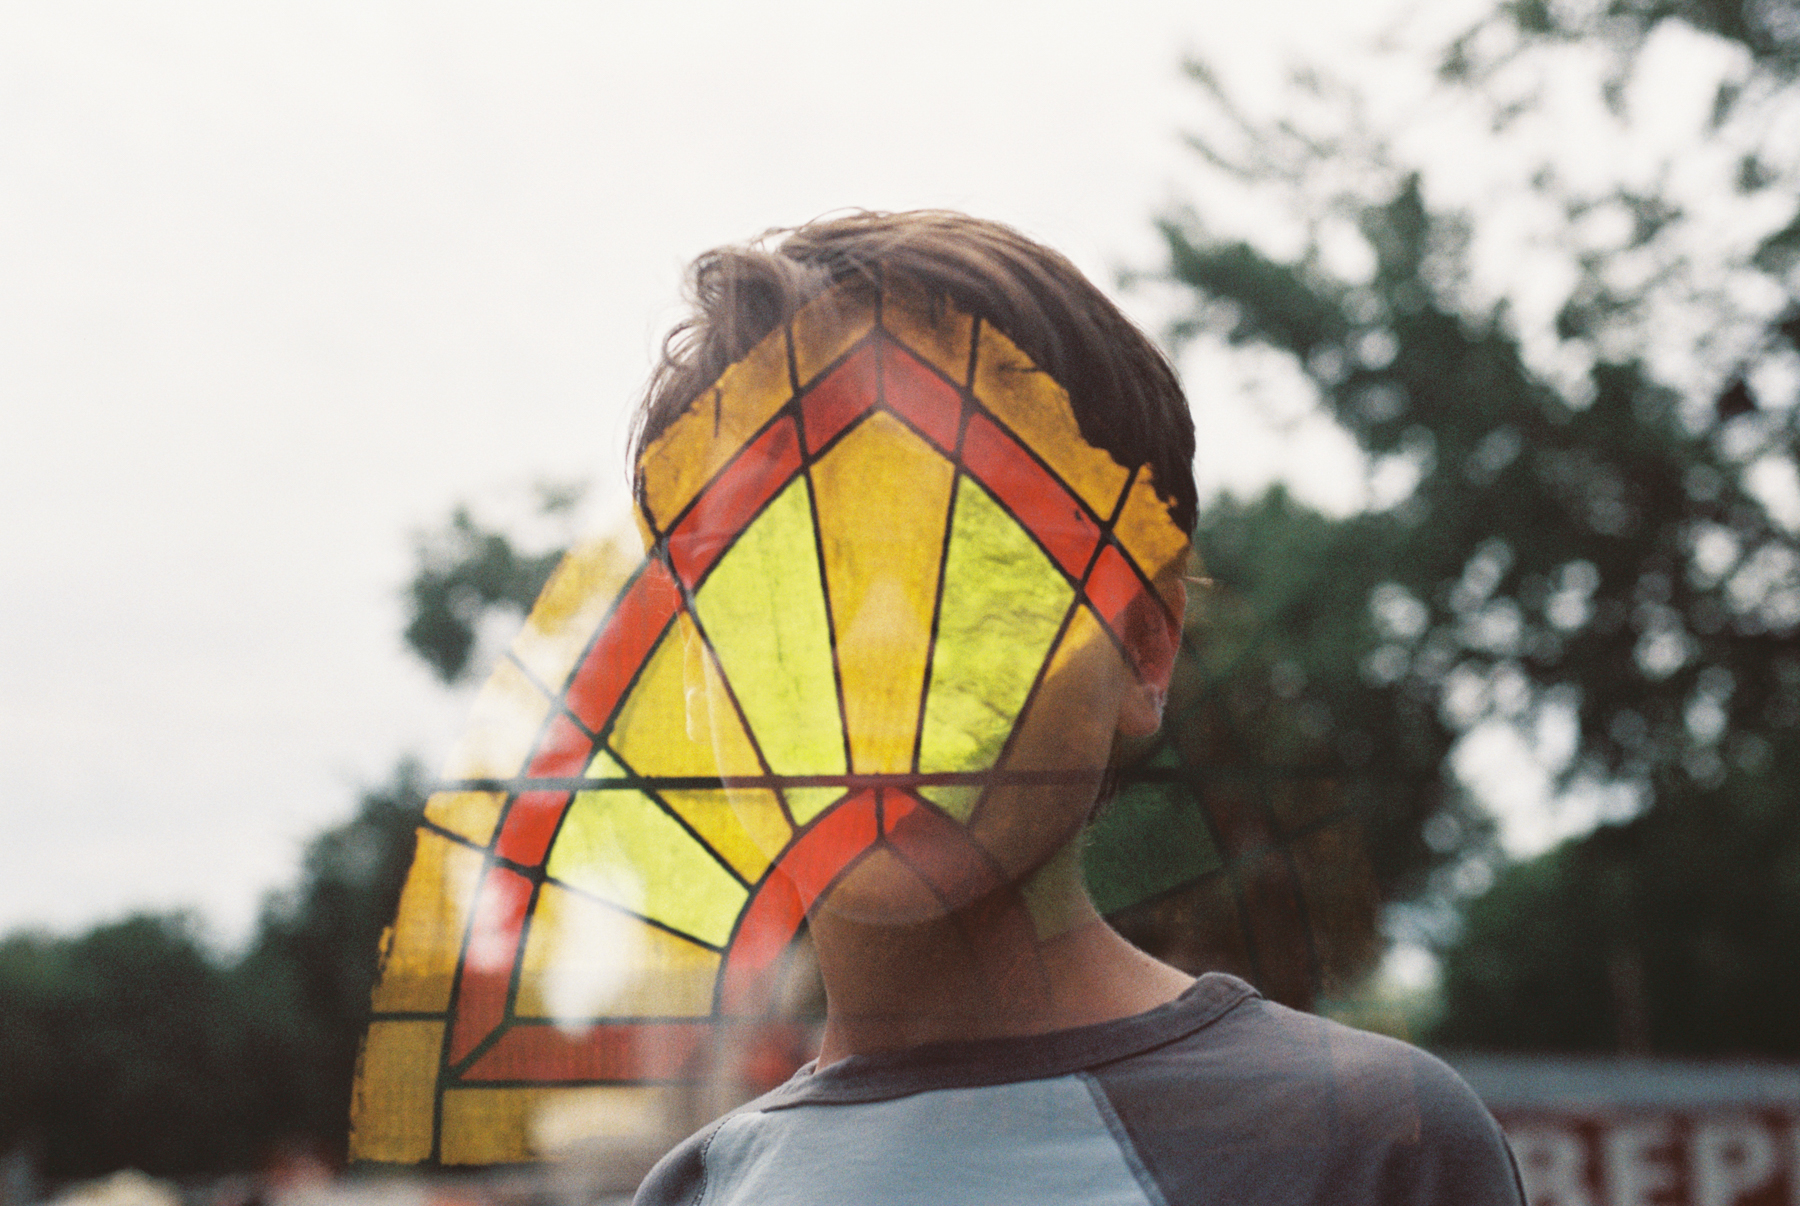 Deborah Candeub - stained glass mask_Nikon F100_Fuji ProPlus200_Deborah Candeub.jpg